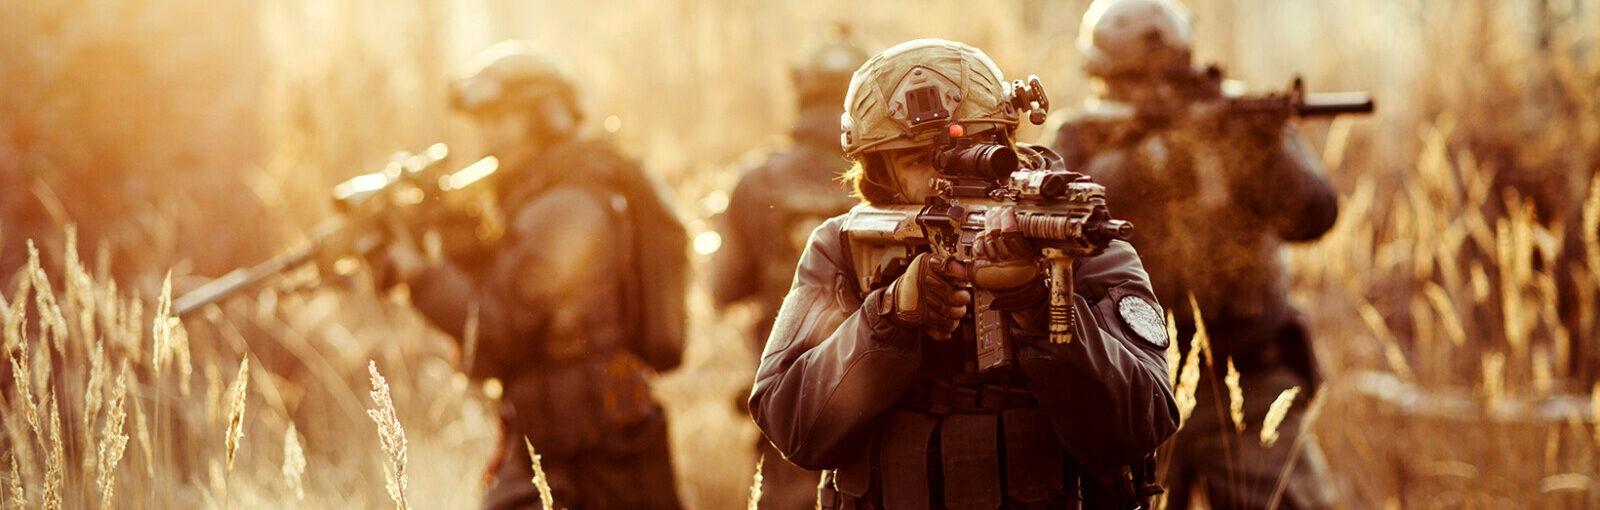 Primetake Defence Industry